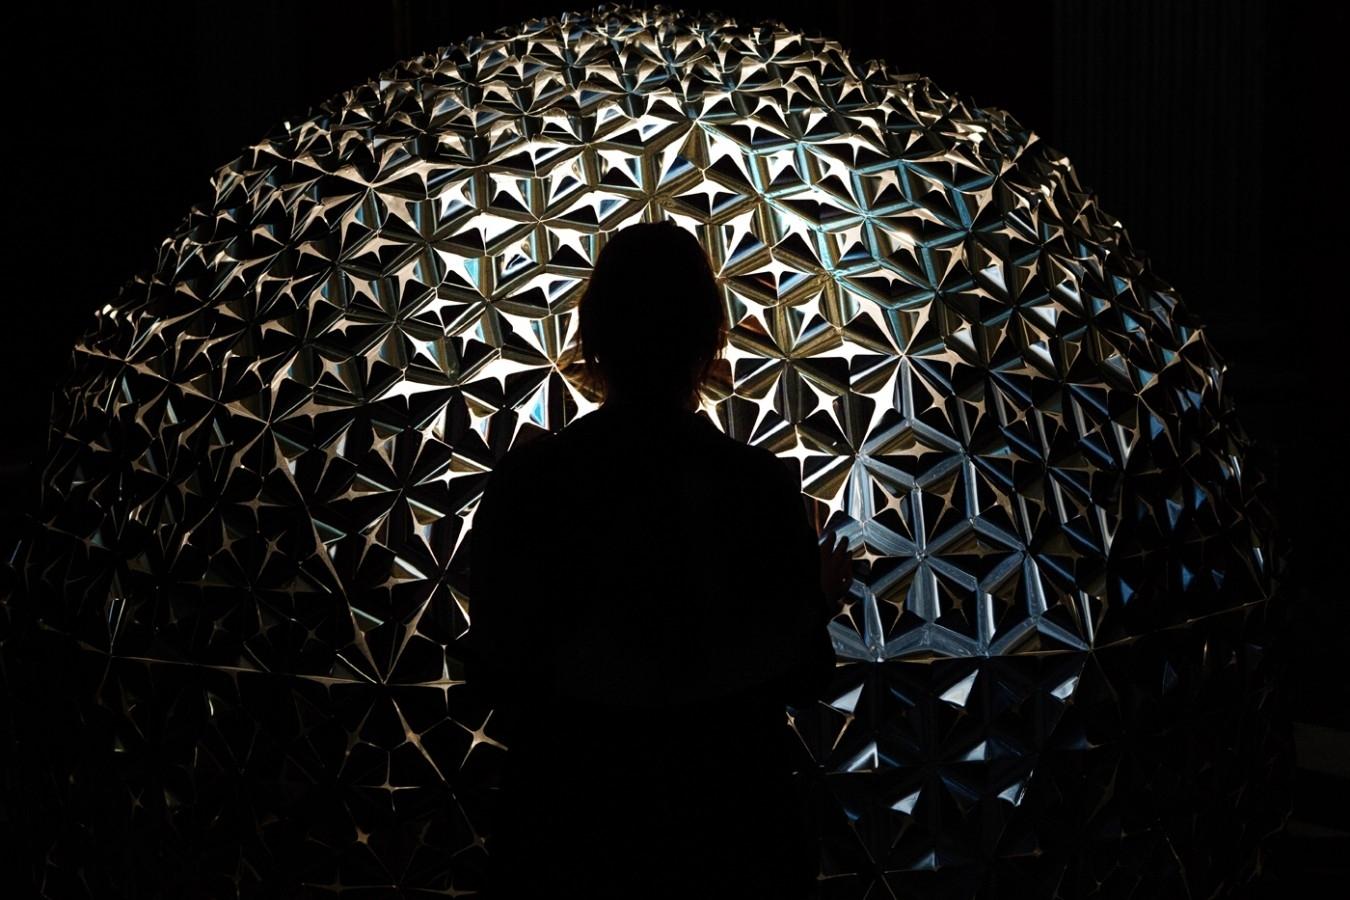 Lotus 7.0 / Lotus Dome image